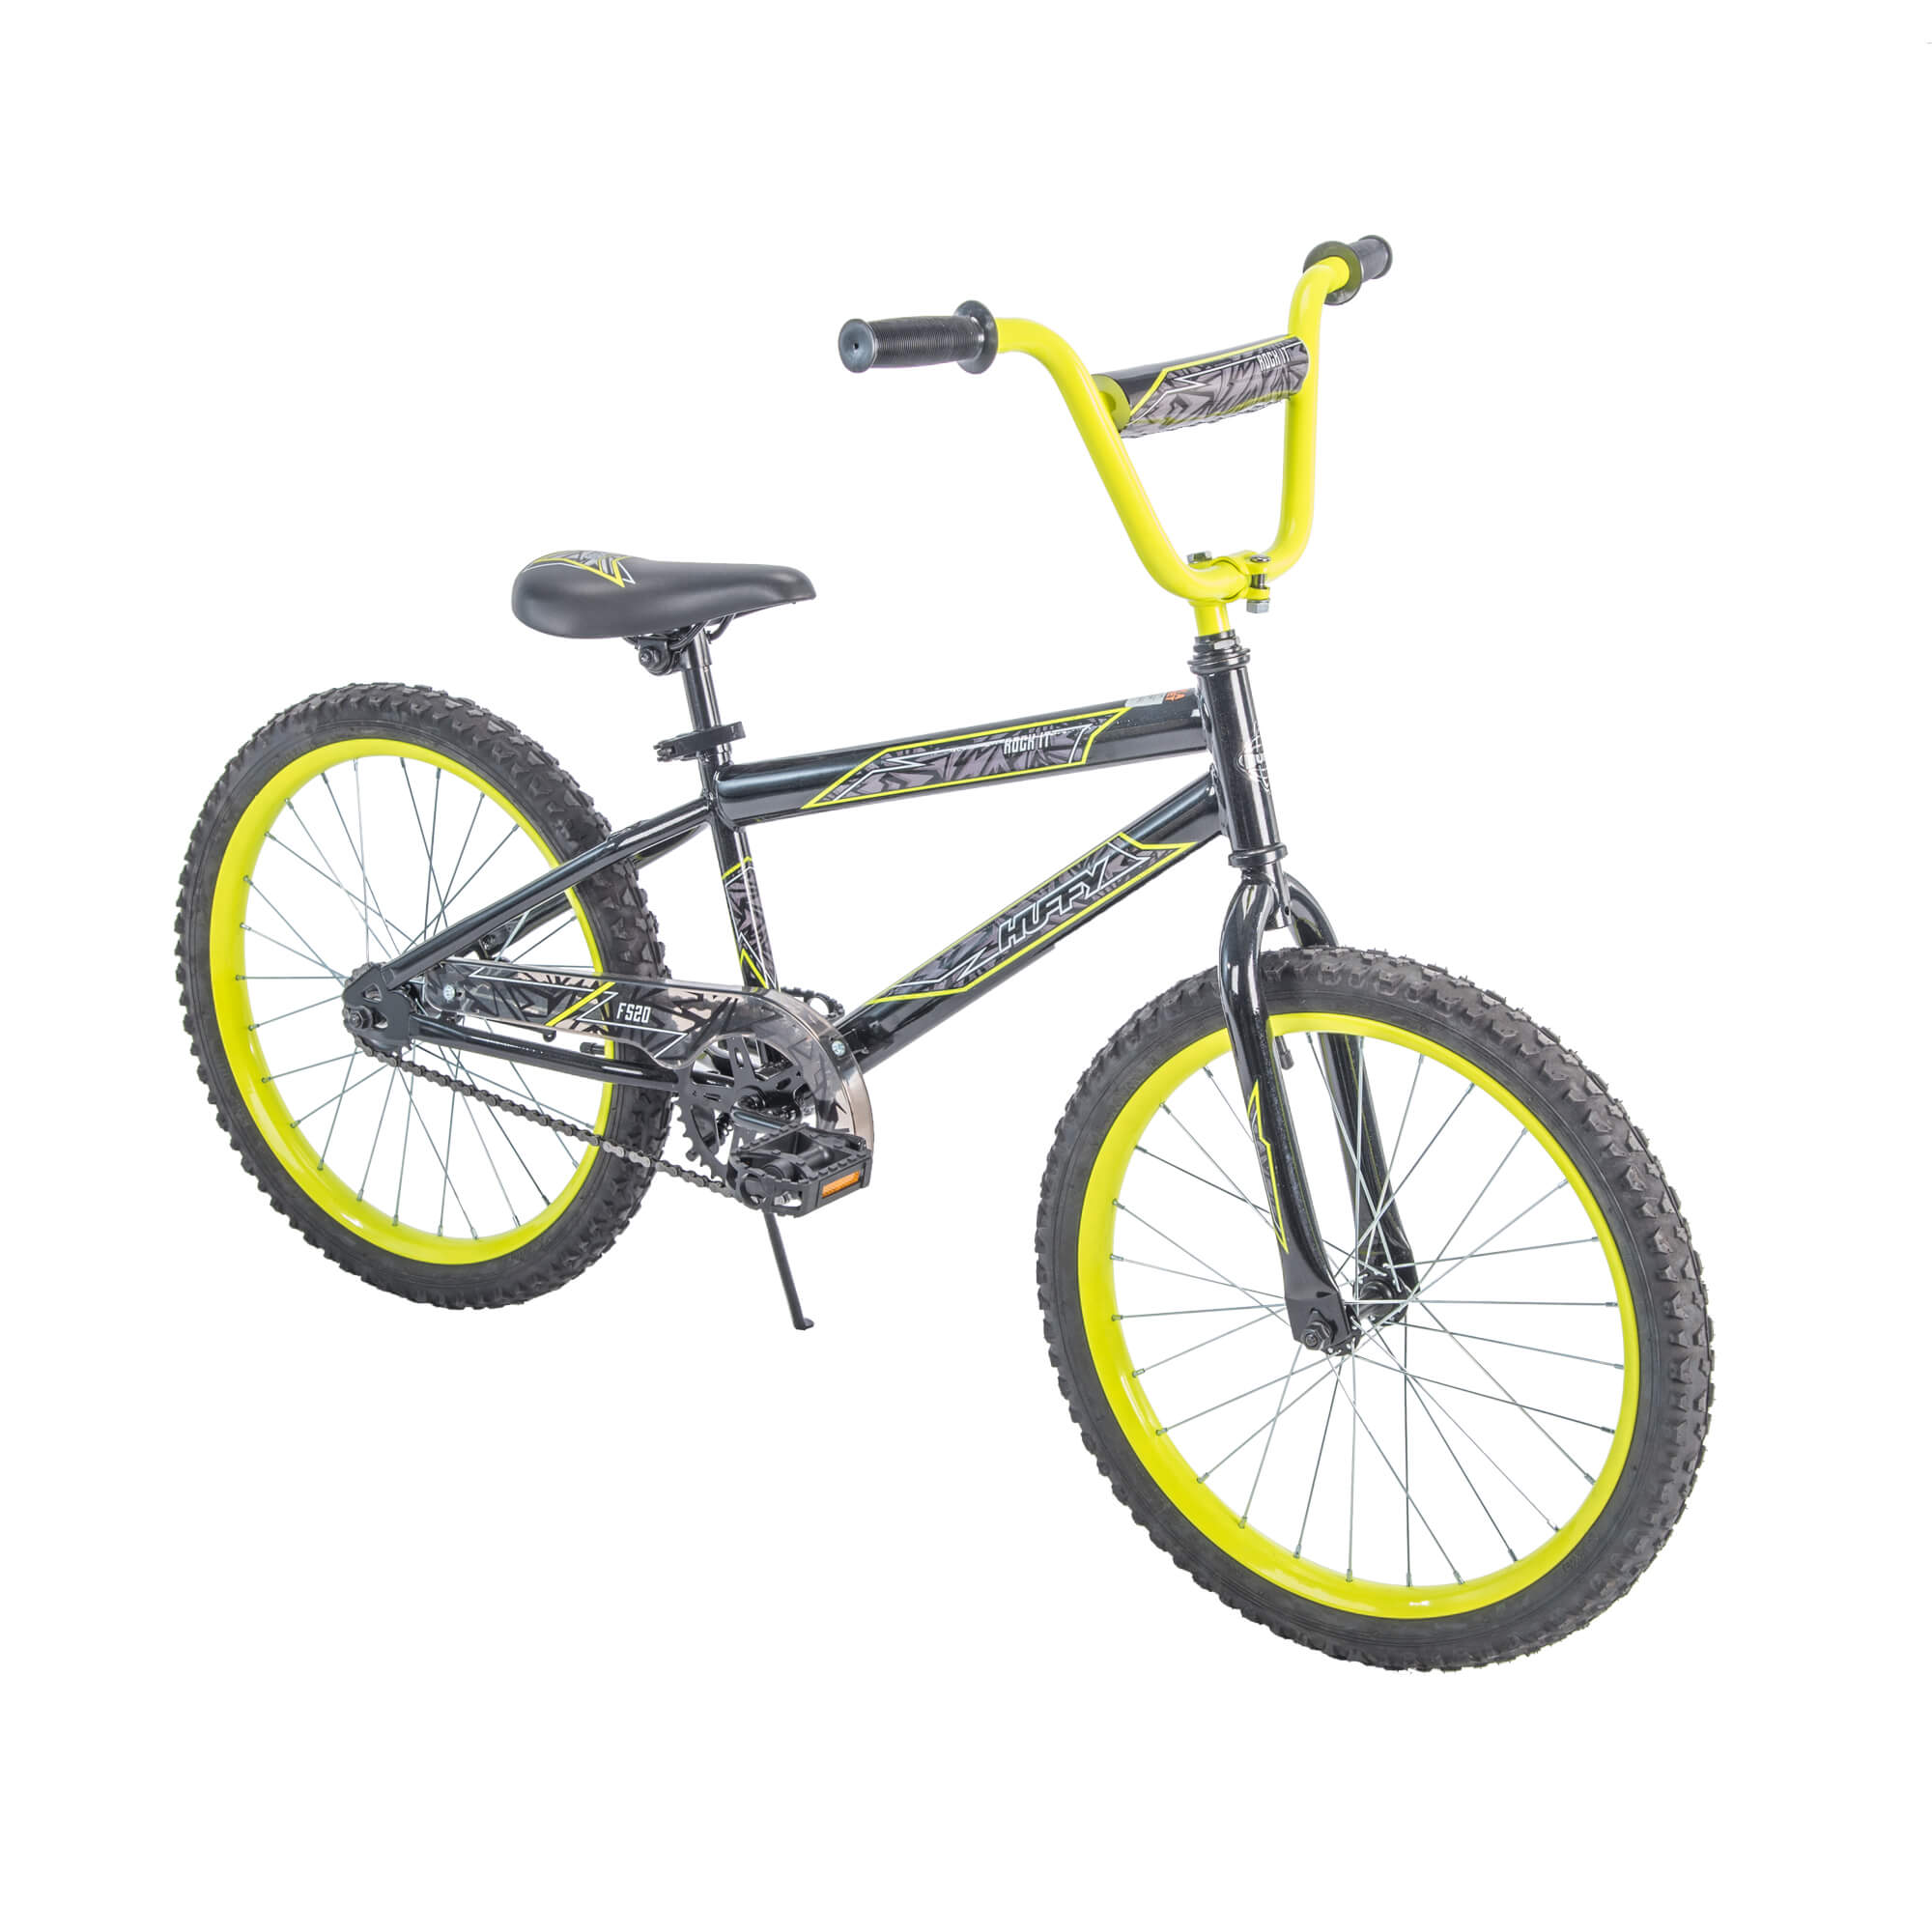 "Huffy 20"" Rock It Boys' Bike, Metallic Black with Neon Yellow Accents"